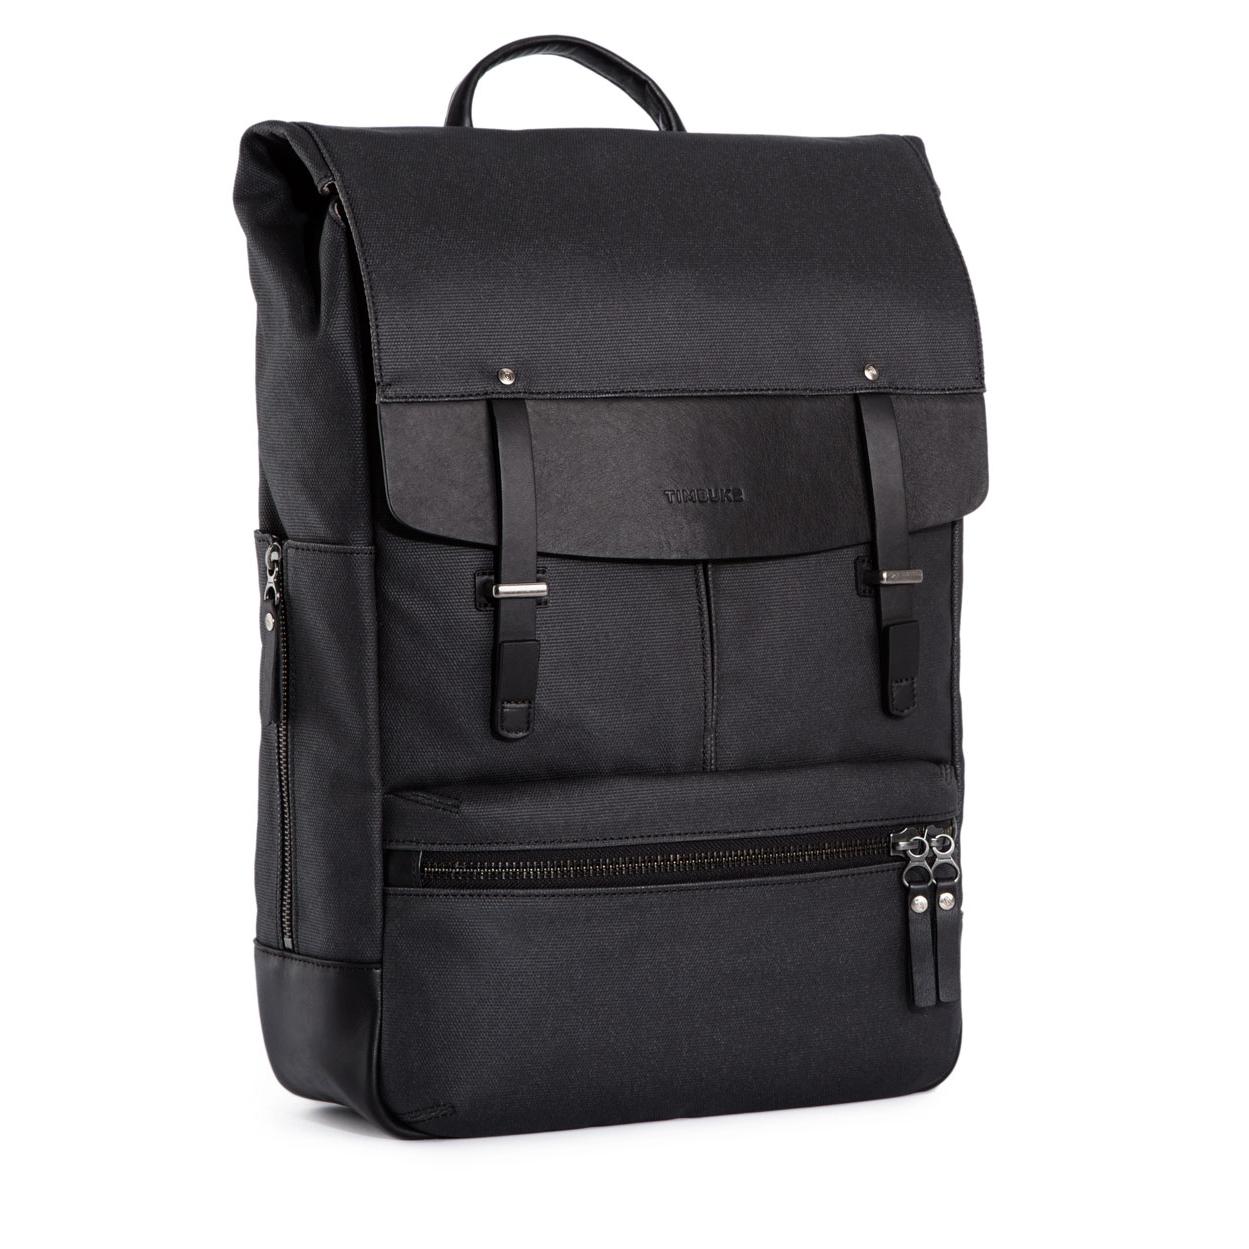 "<h2><a href=""http://www.timbuk2.com/walker-laptop-macbook-backpack/488.html?dwvar_488_color=2000&dwvar_488_size=7"">Timbuk2 Walker Backpack, $278</a></h2>"